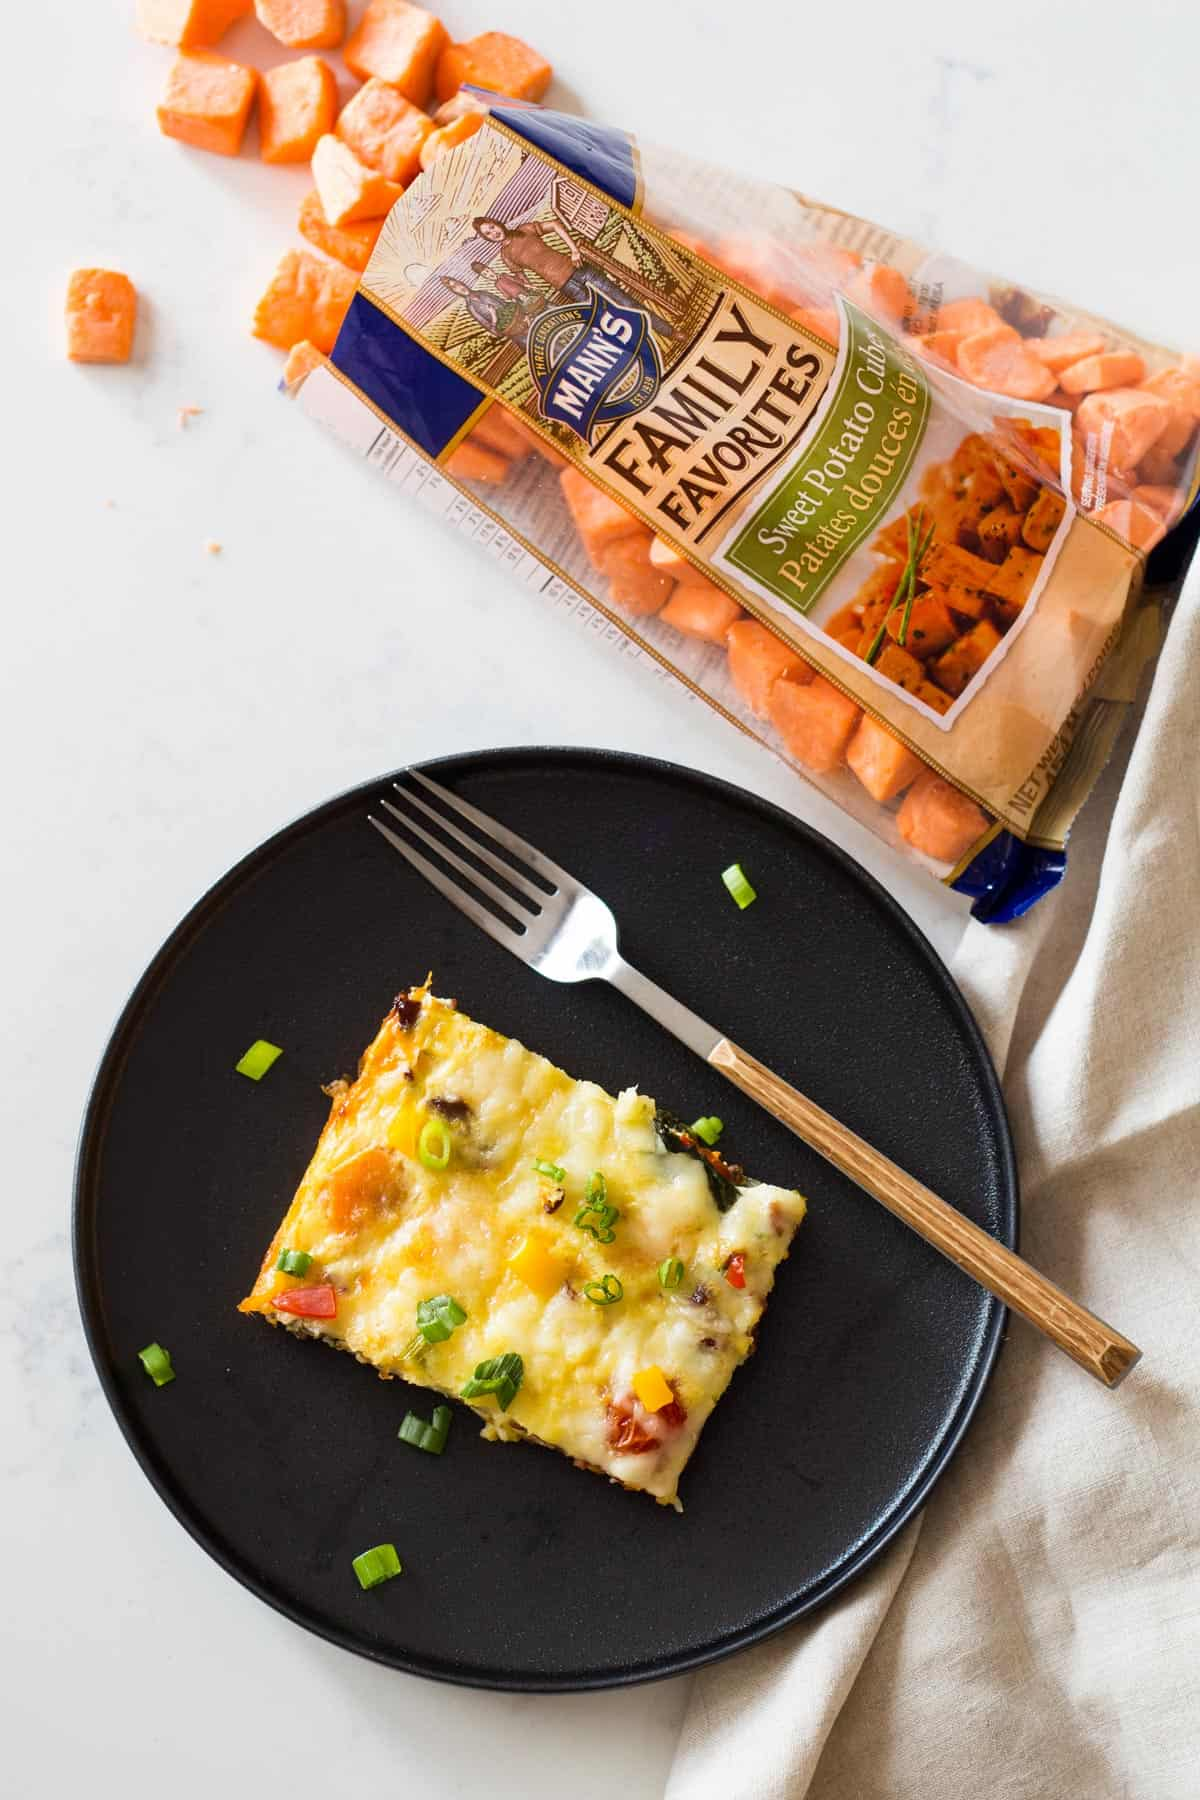 Sweet Potato Casserole with Eggs